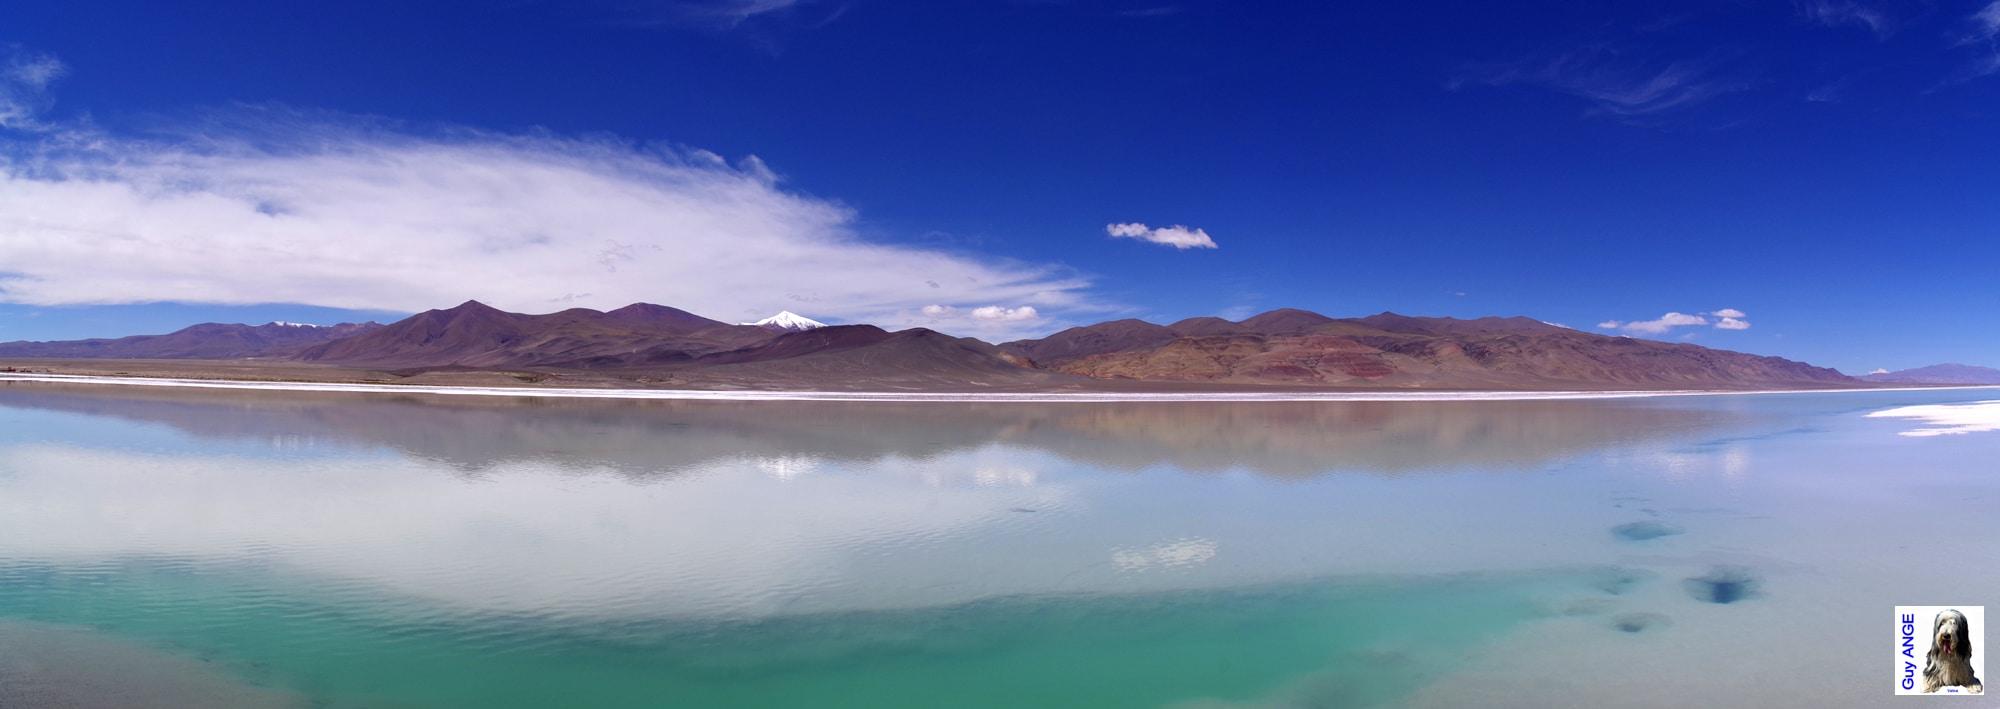 Argentine, région de la Puna. La Laguna Seca.